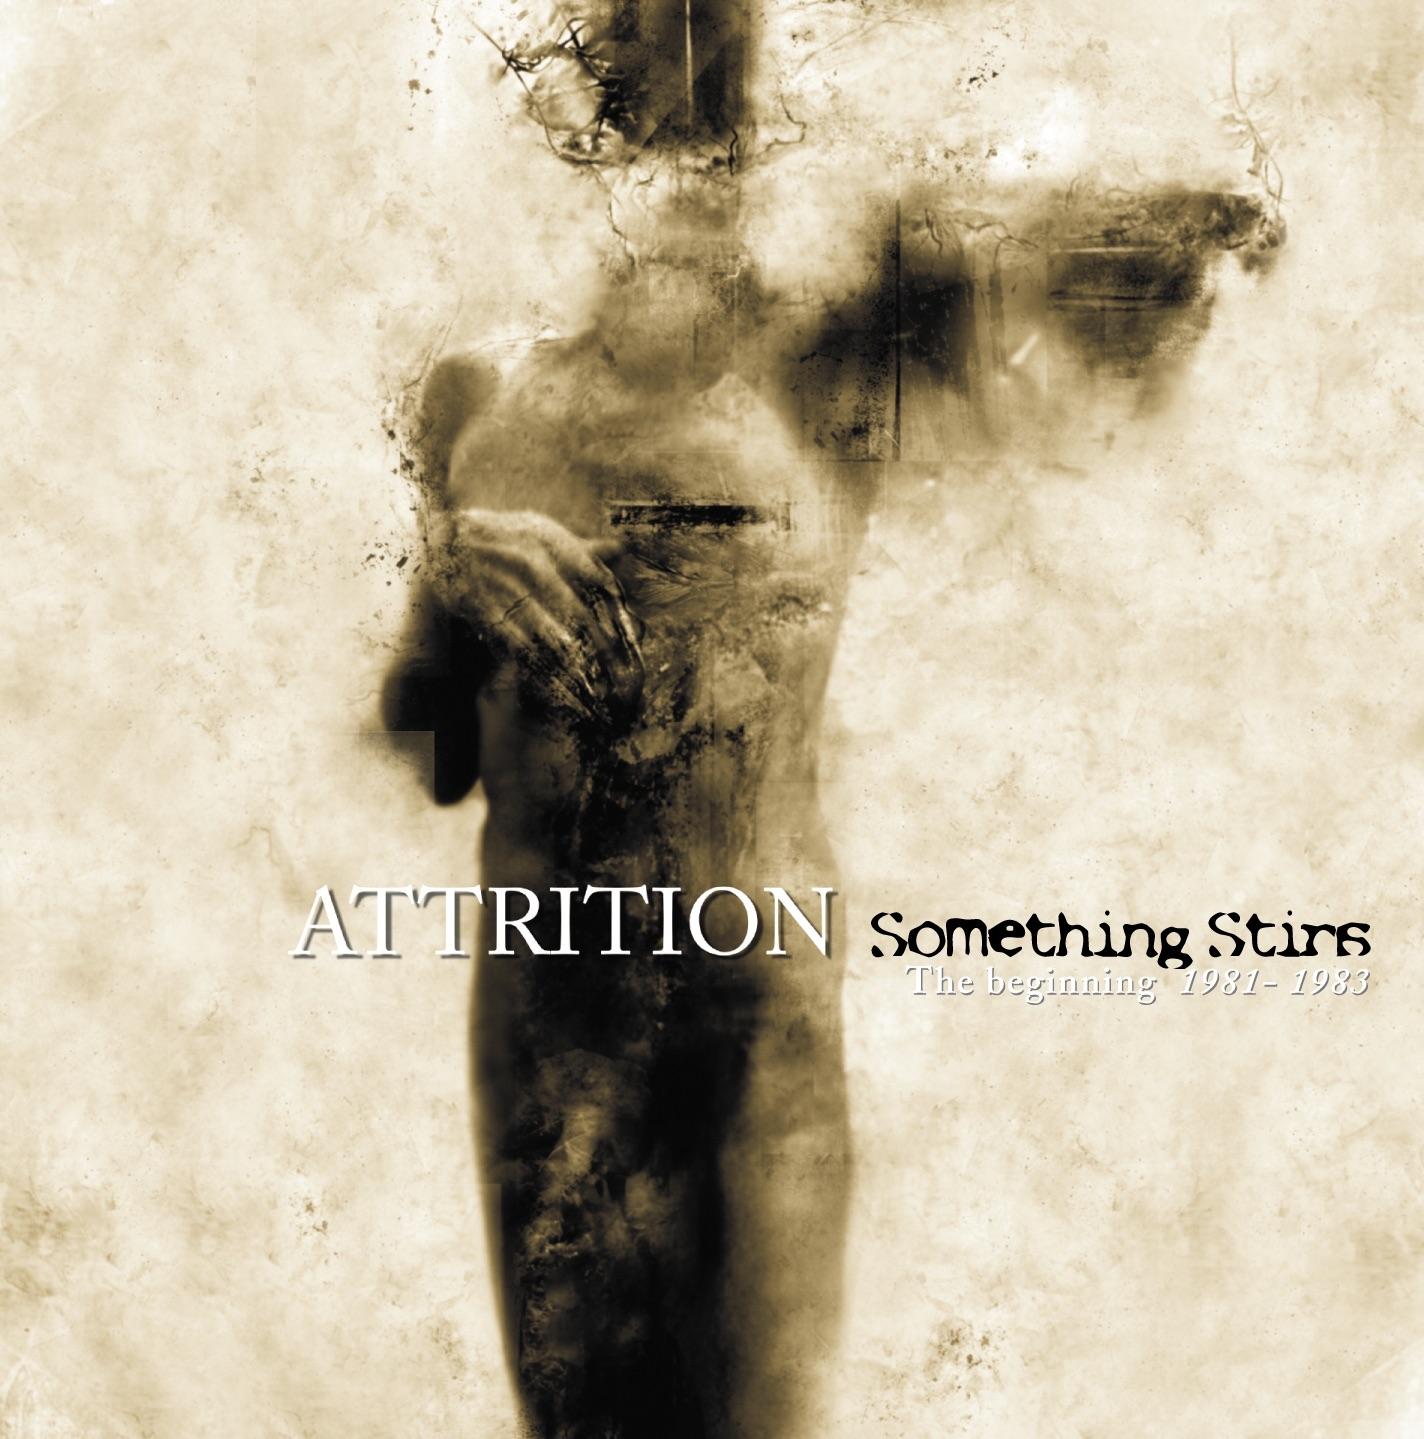 Something Stirs - The Beginning (1981-1983) [Remastered]